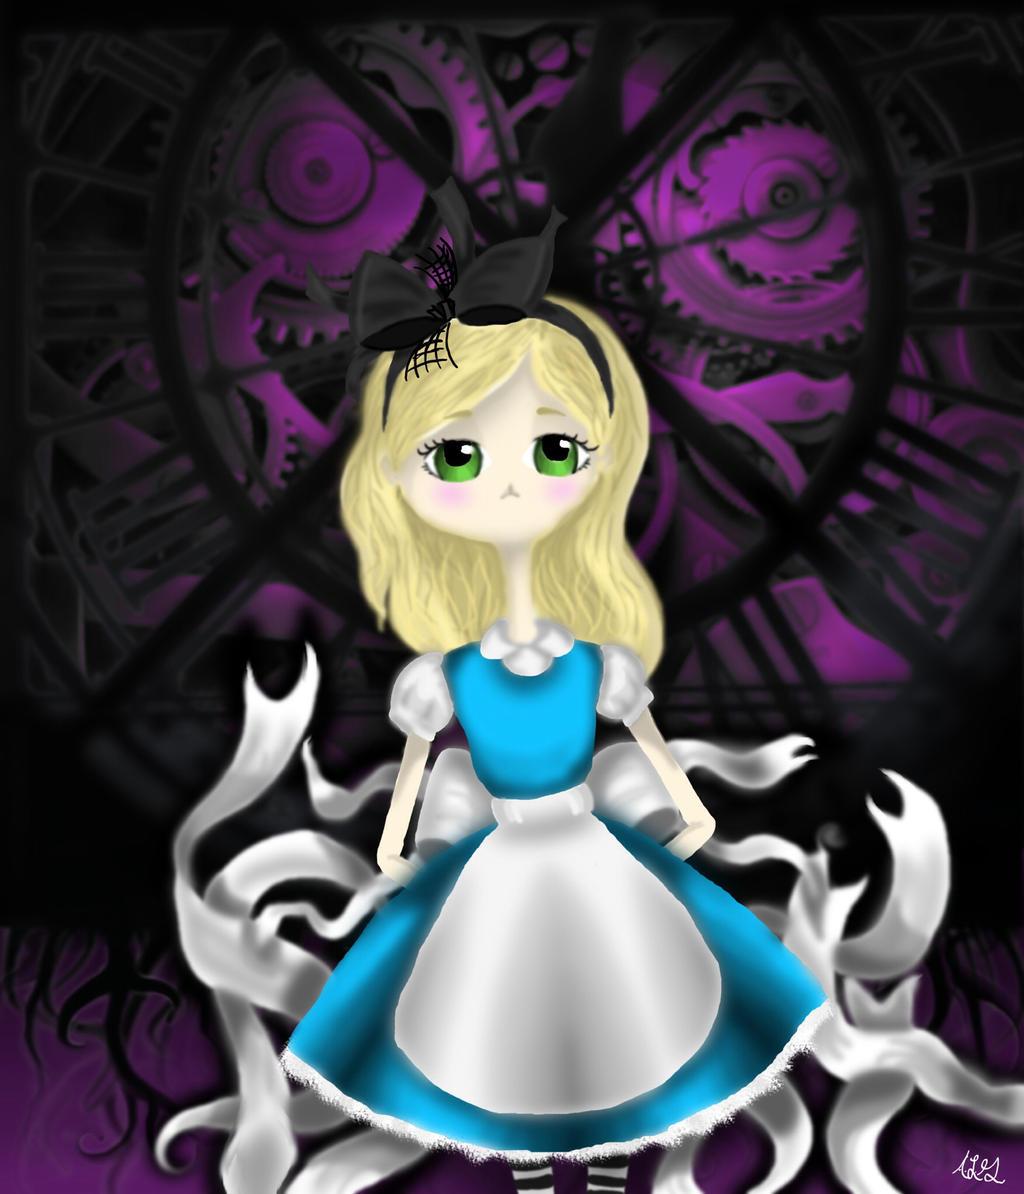 Alice in Wonderland by WonderlandSeaMonster